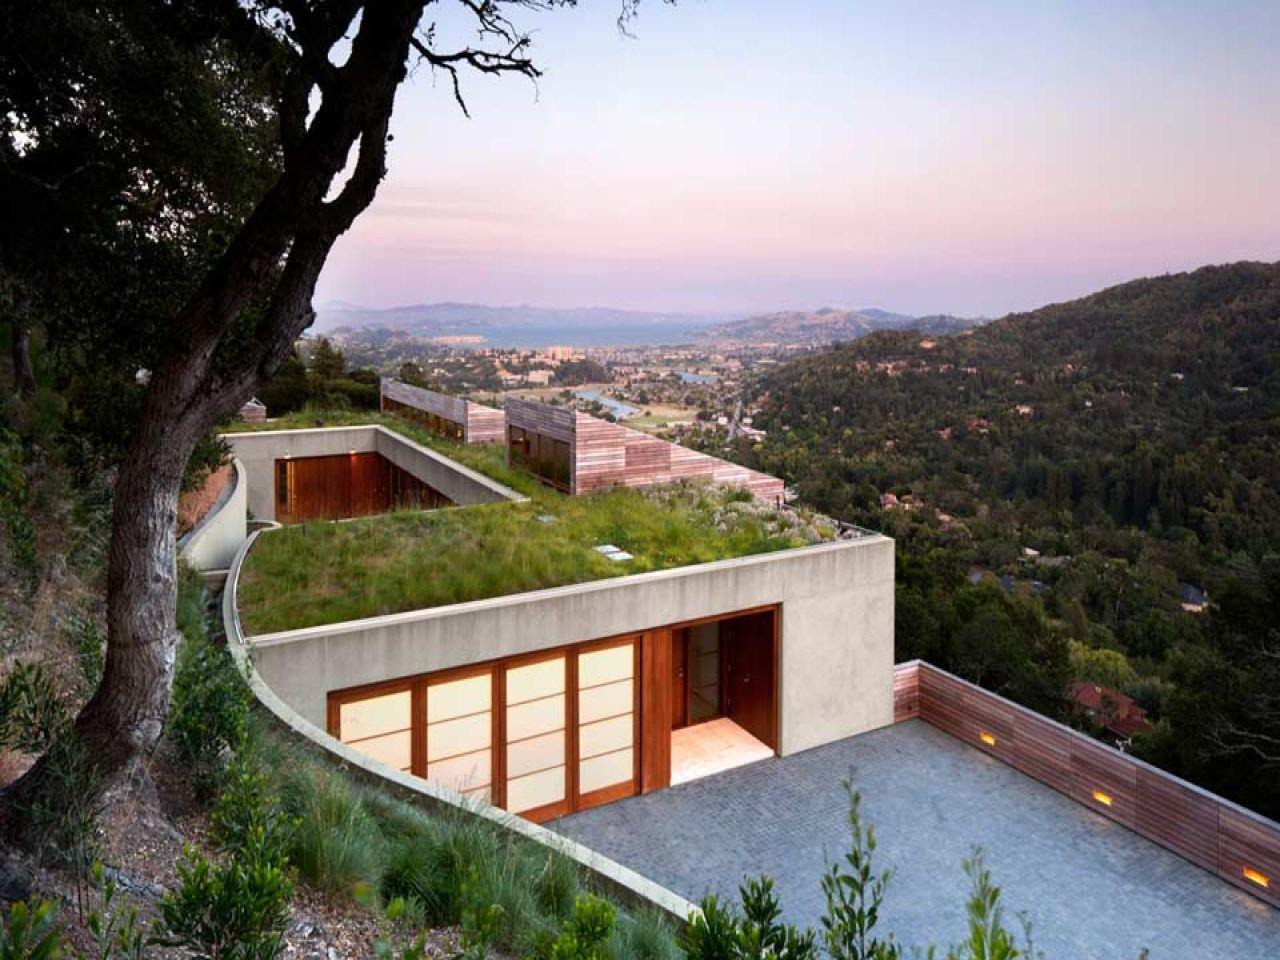 Steep Slope Home Design -steep-hillside-house-plans